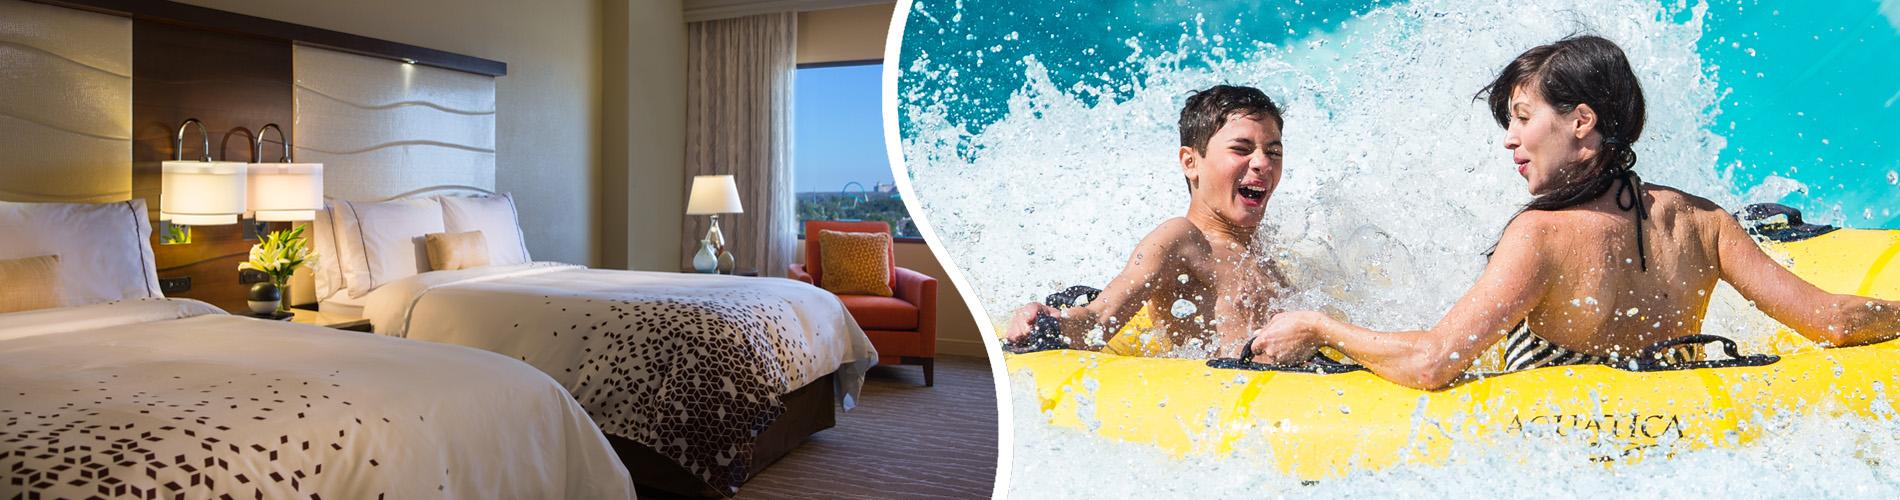 Vacation Packages at Aquatica Orlando